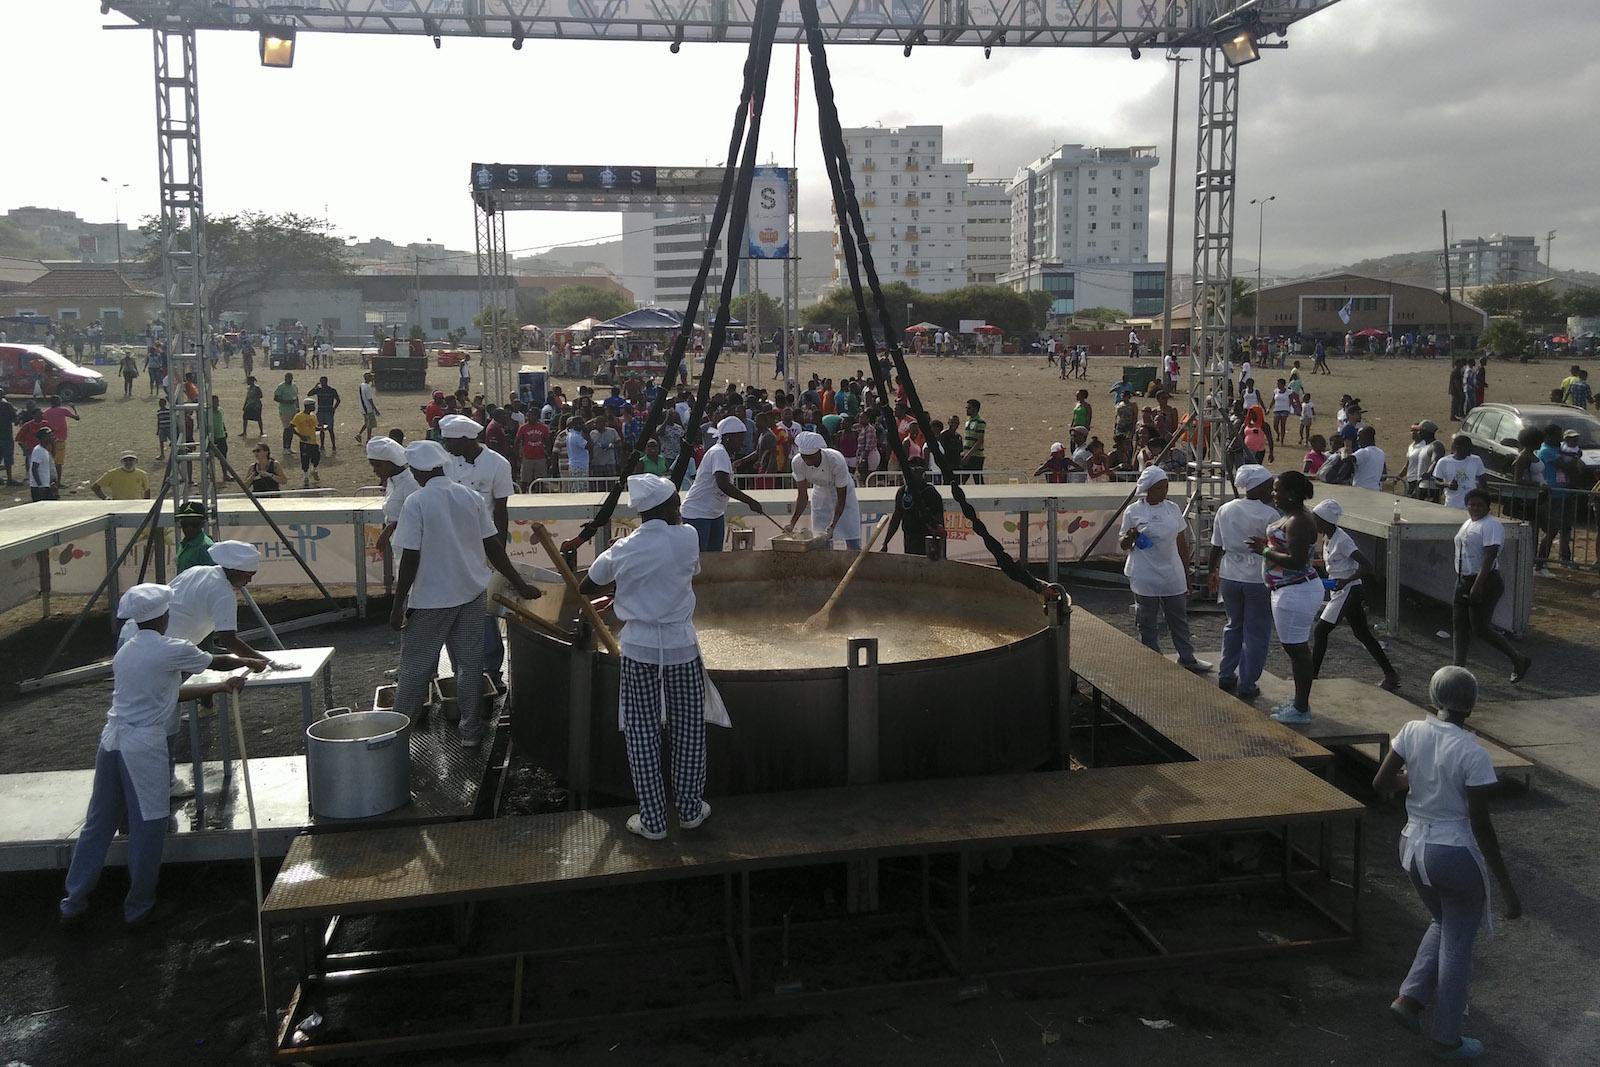 "A ""Maior cachupa do mundo"" – 5.000 quilogramas de cachupa, prato típico de Cabo Verde, na Cidade da Praia, Cabo Verde, 12 de julho de 2015. JOSÉ SOUSA DIAS/LUSA"